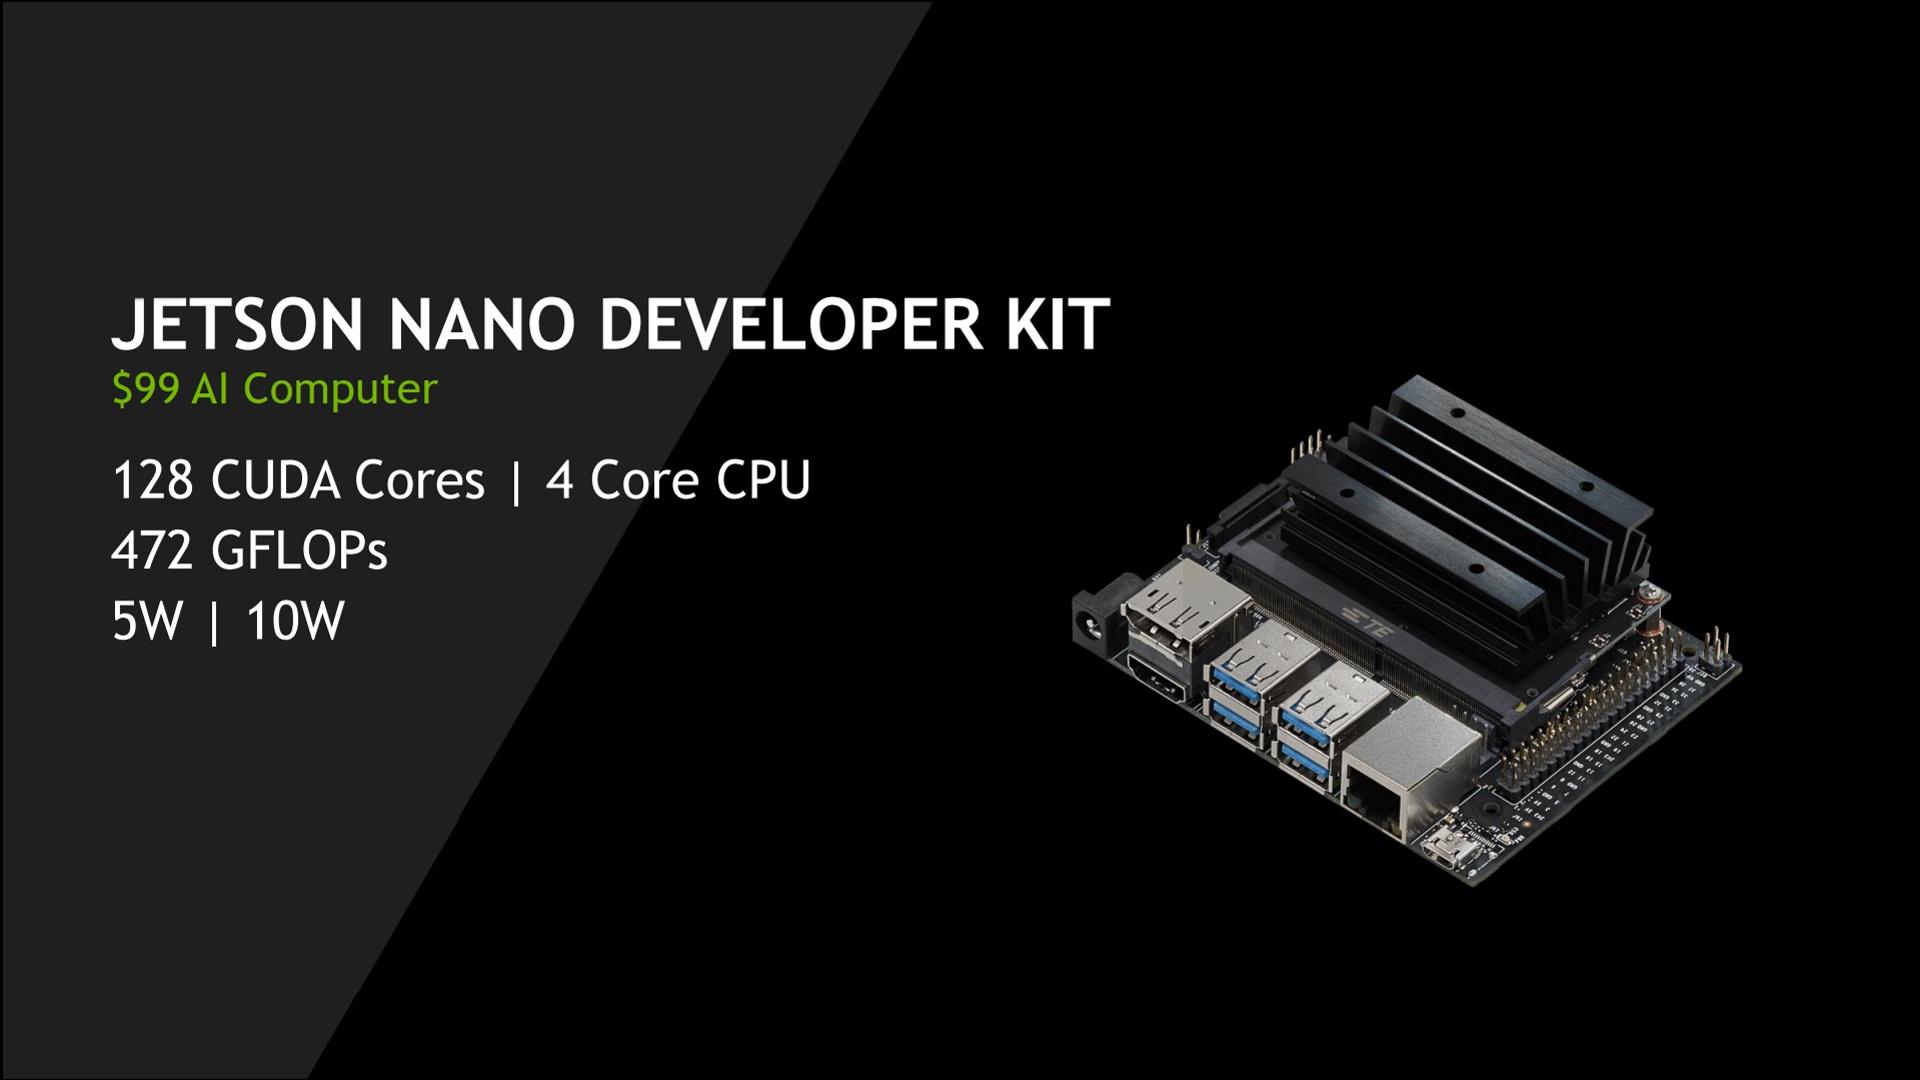 Promo photo of the new Nvidia Jetson Nano alongside the specs and price info.